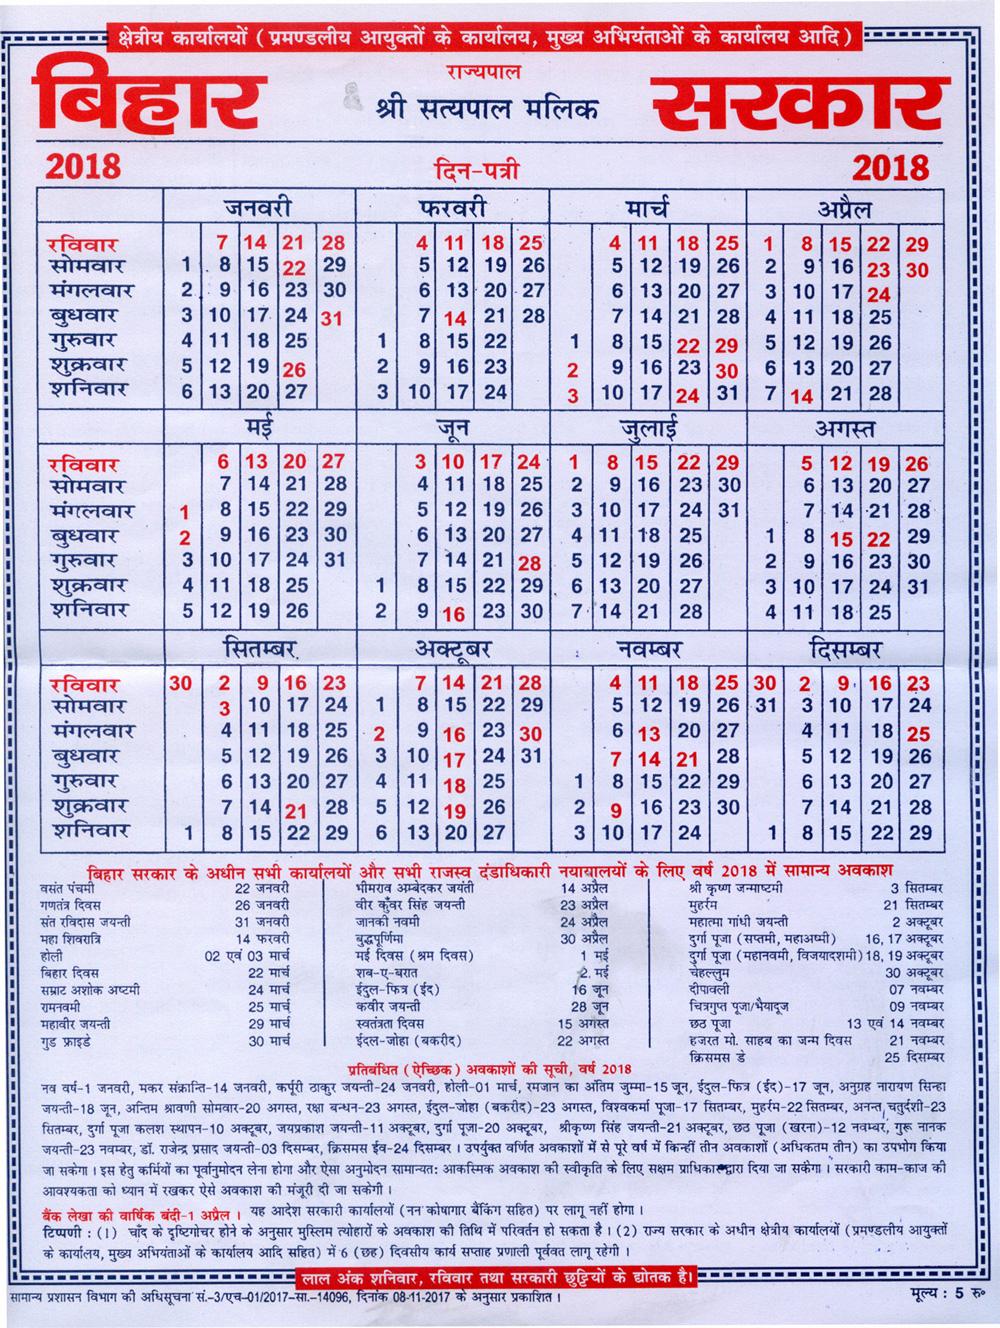 Bihar Govt. Calendar 2018, Bihar Govt. Holiday List, Holiday within Bihar Calendar 2020